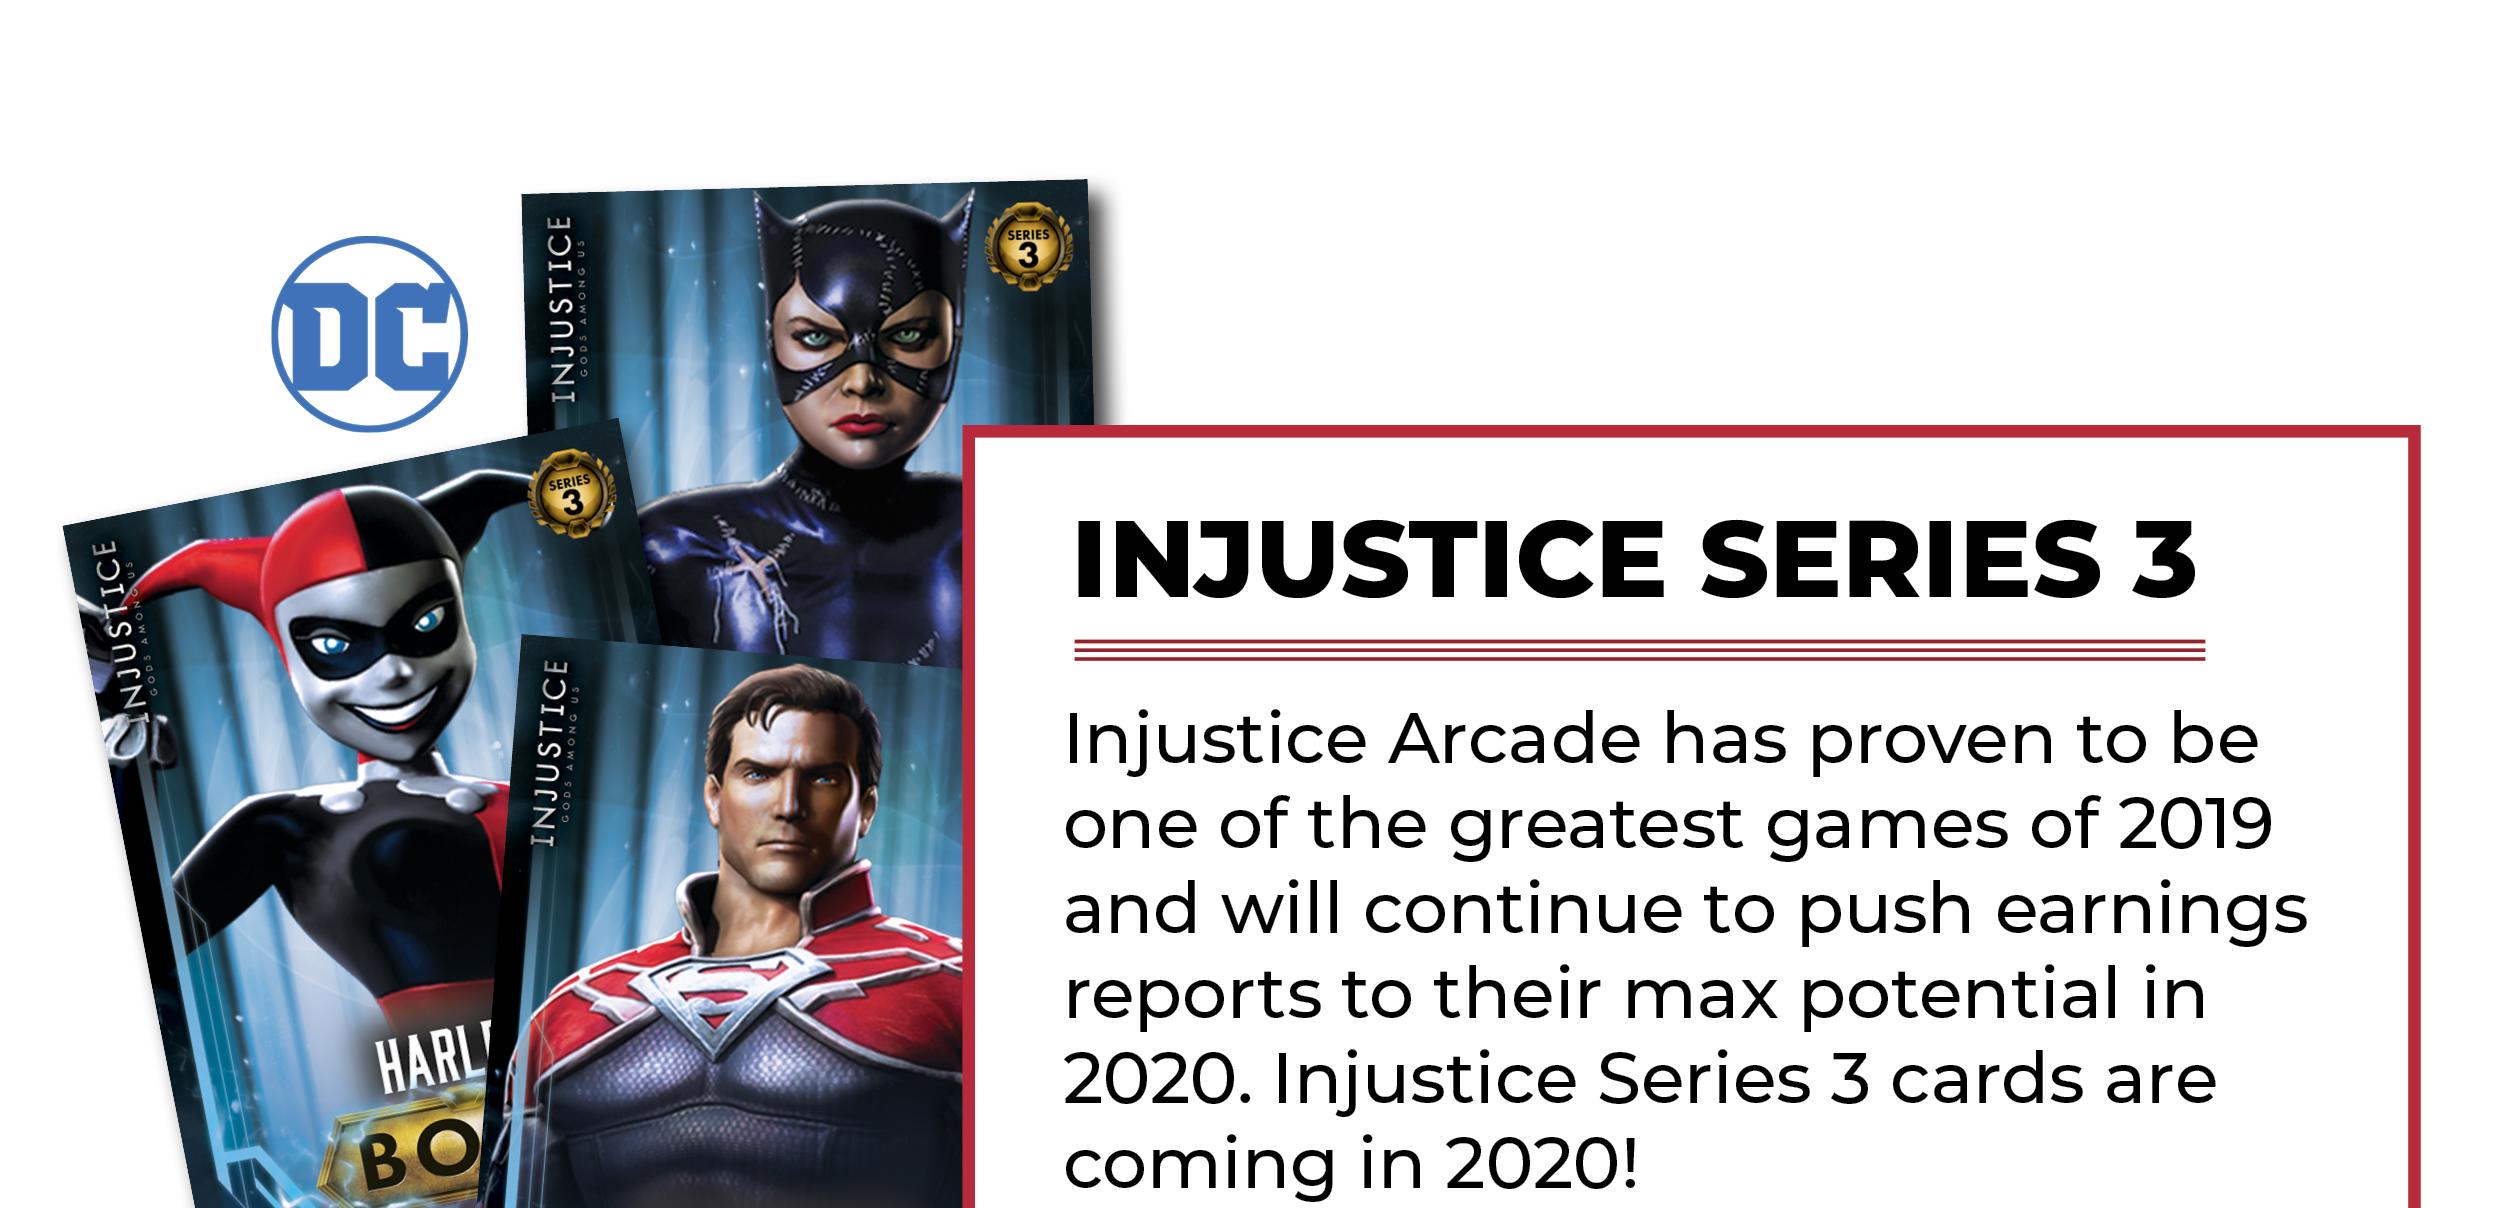 Injustice Series 3